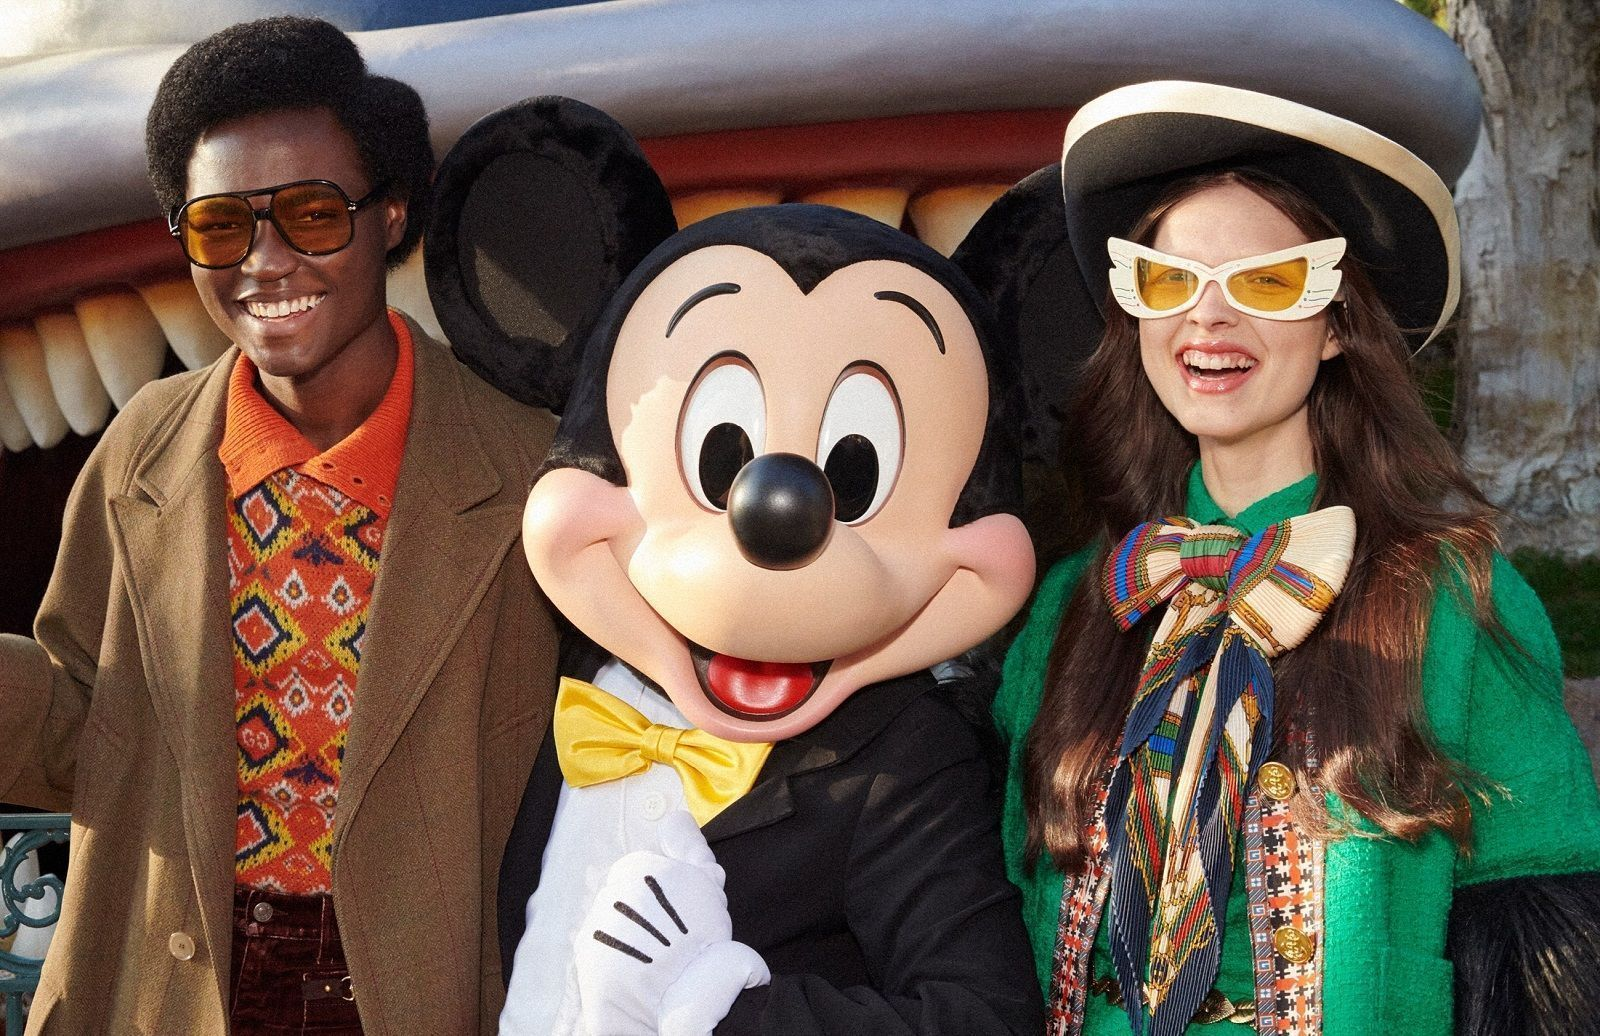 Gucci x Disney - Neomag.